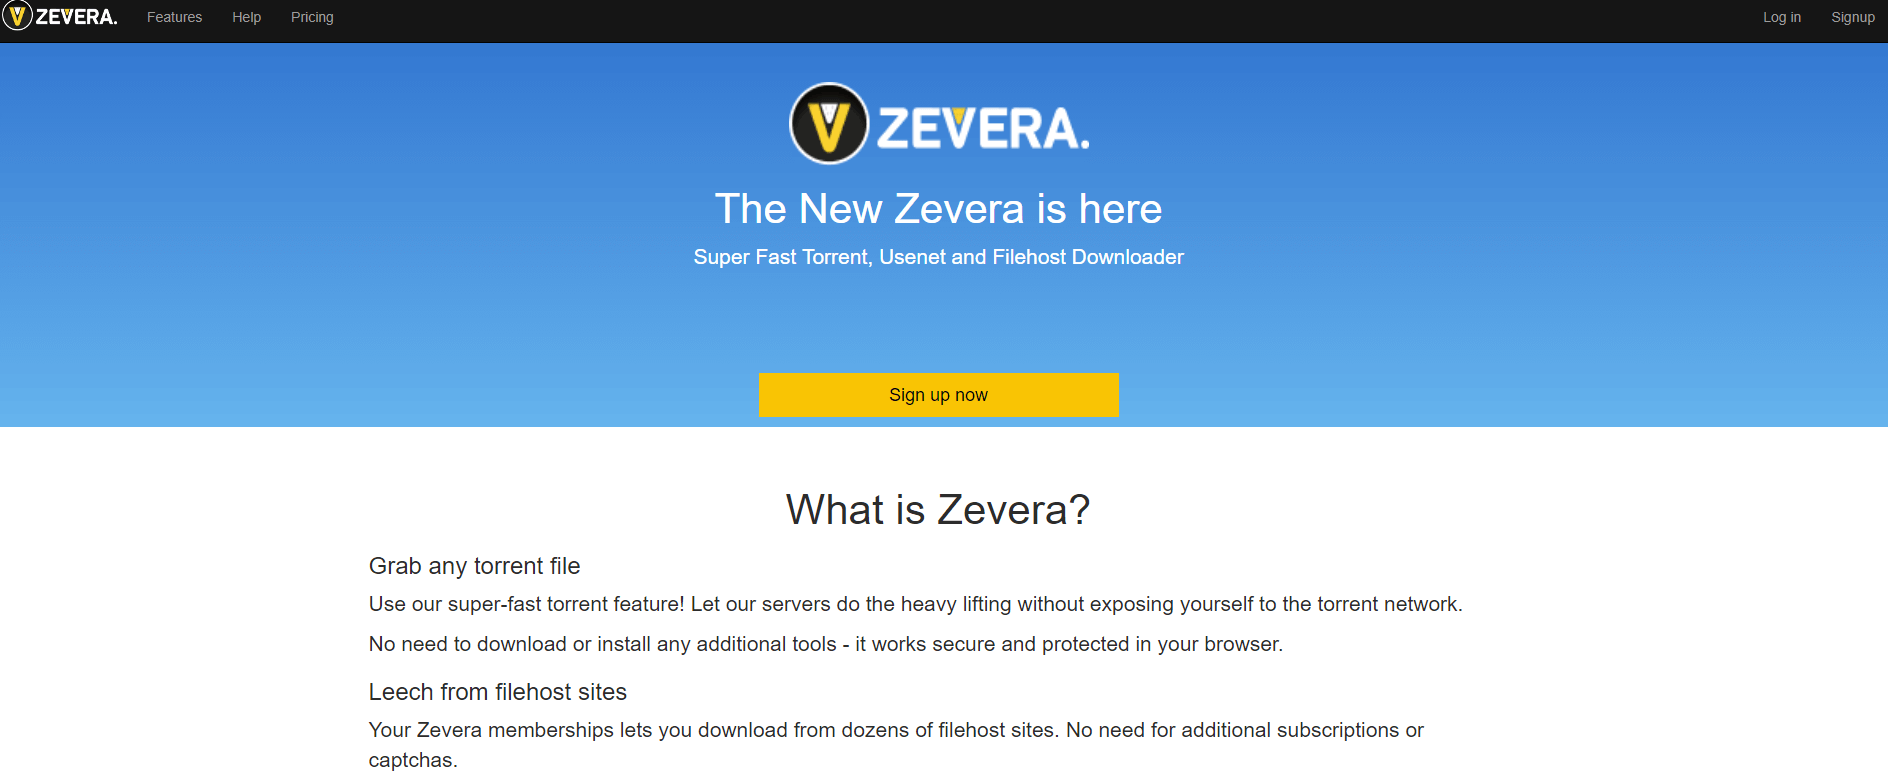 Zevera Preview